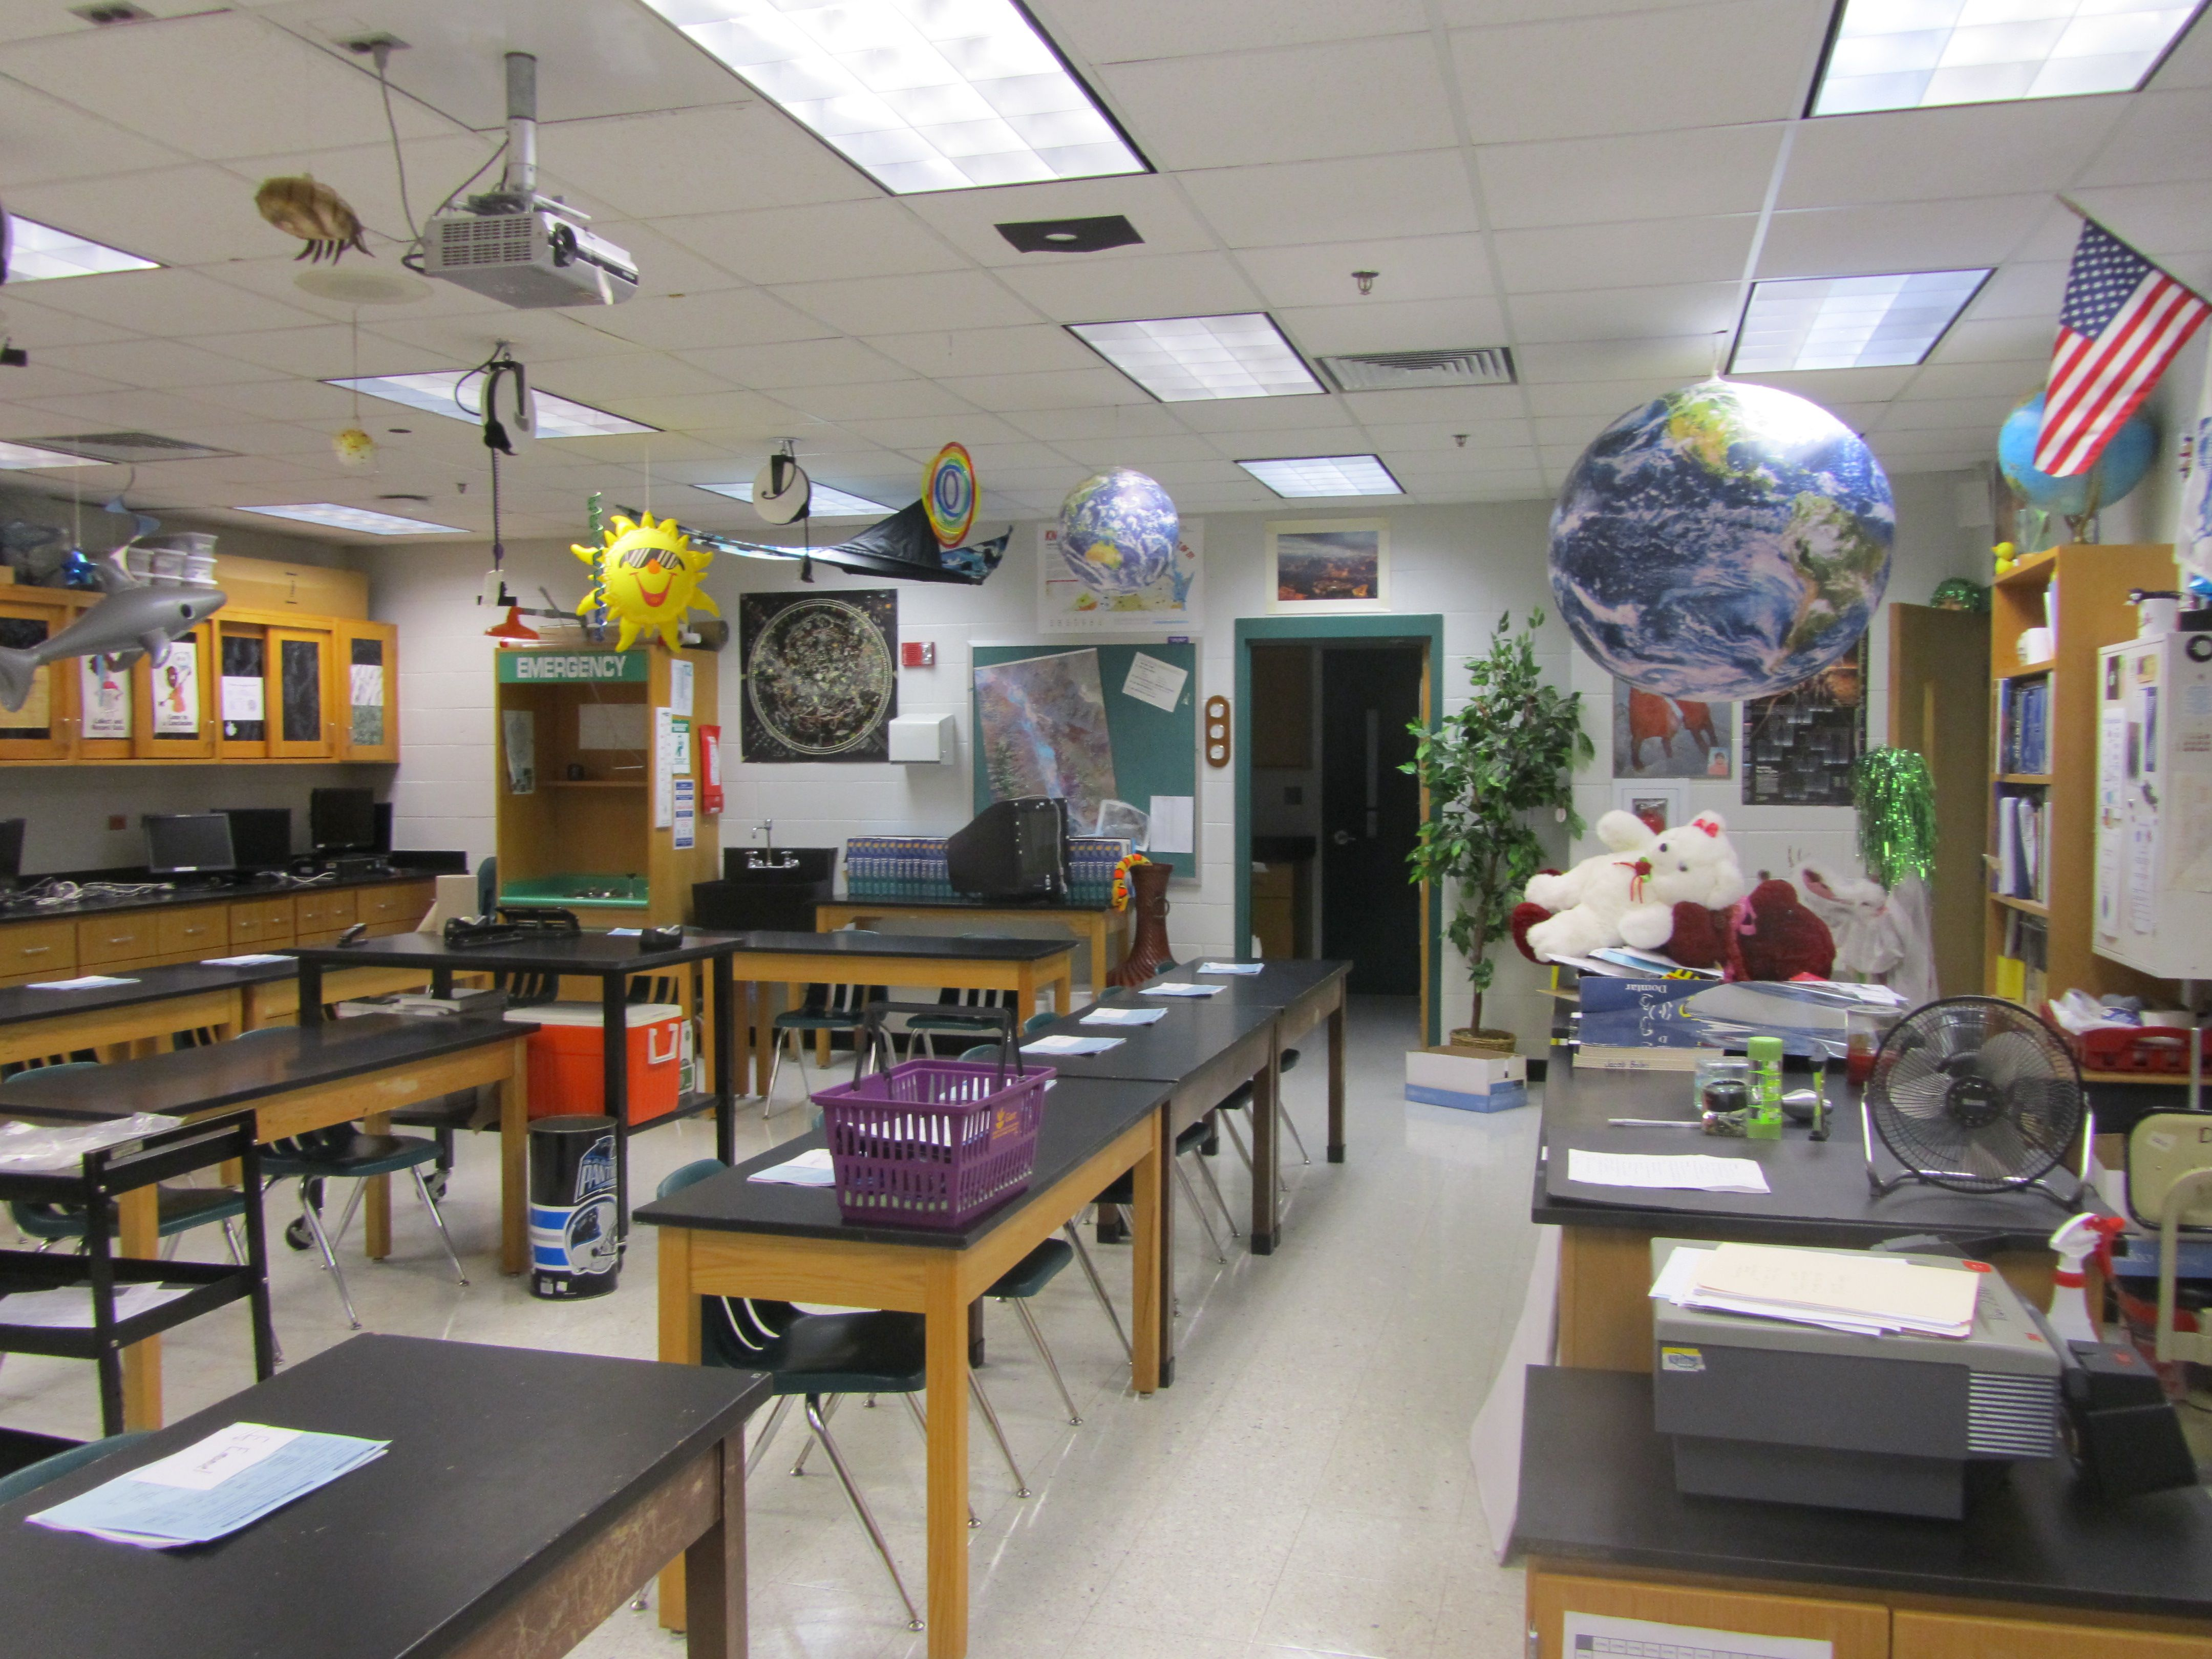 Classroom Decor Items : Classroom photos of mr dyre s high school science lab